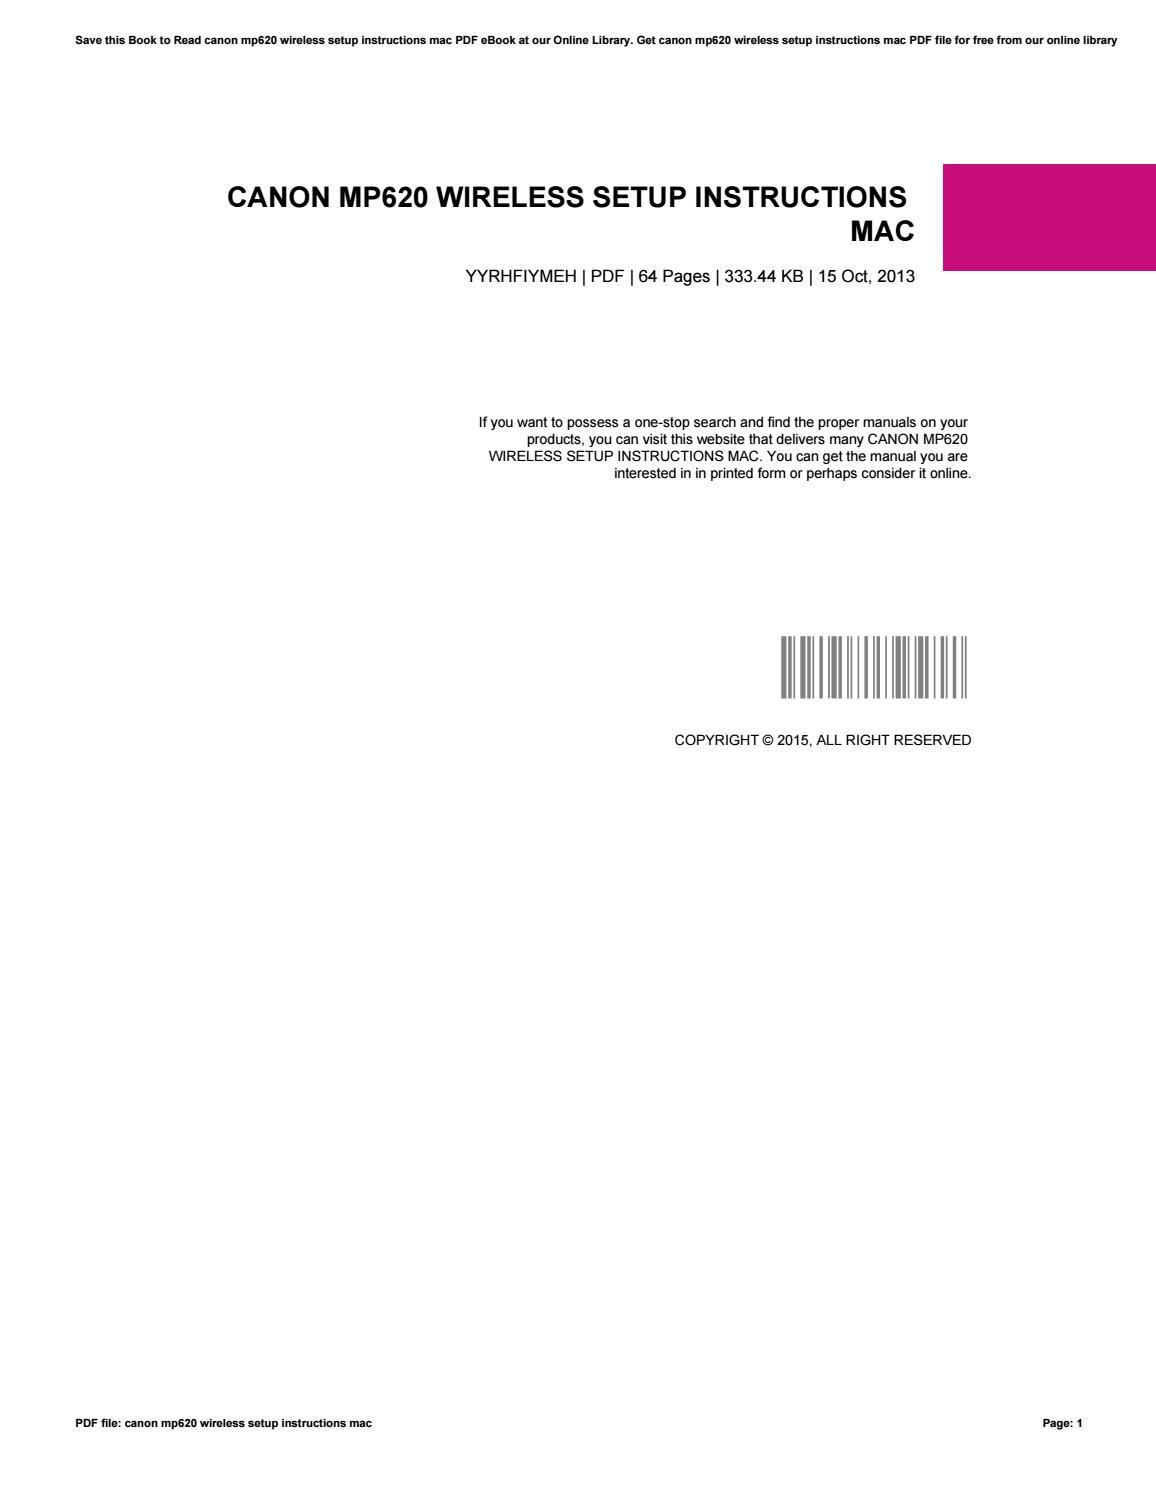 CANON MP620 WIRELESS SETUP WINDOWS 7 DRIVER